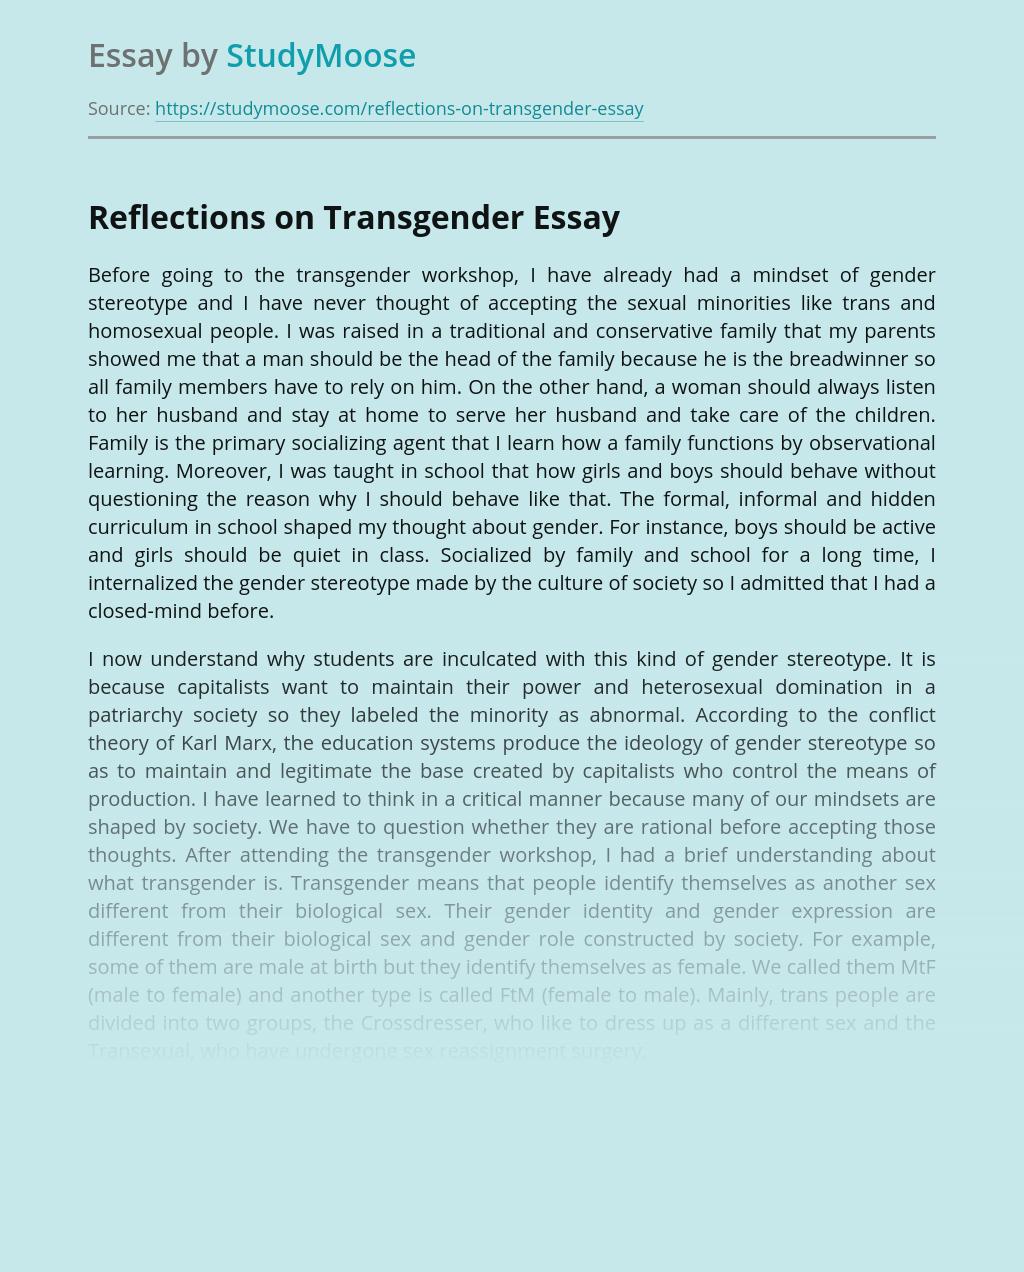 Reflections on Transgender